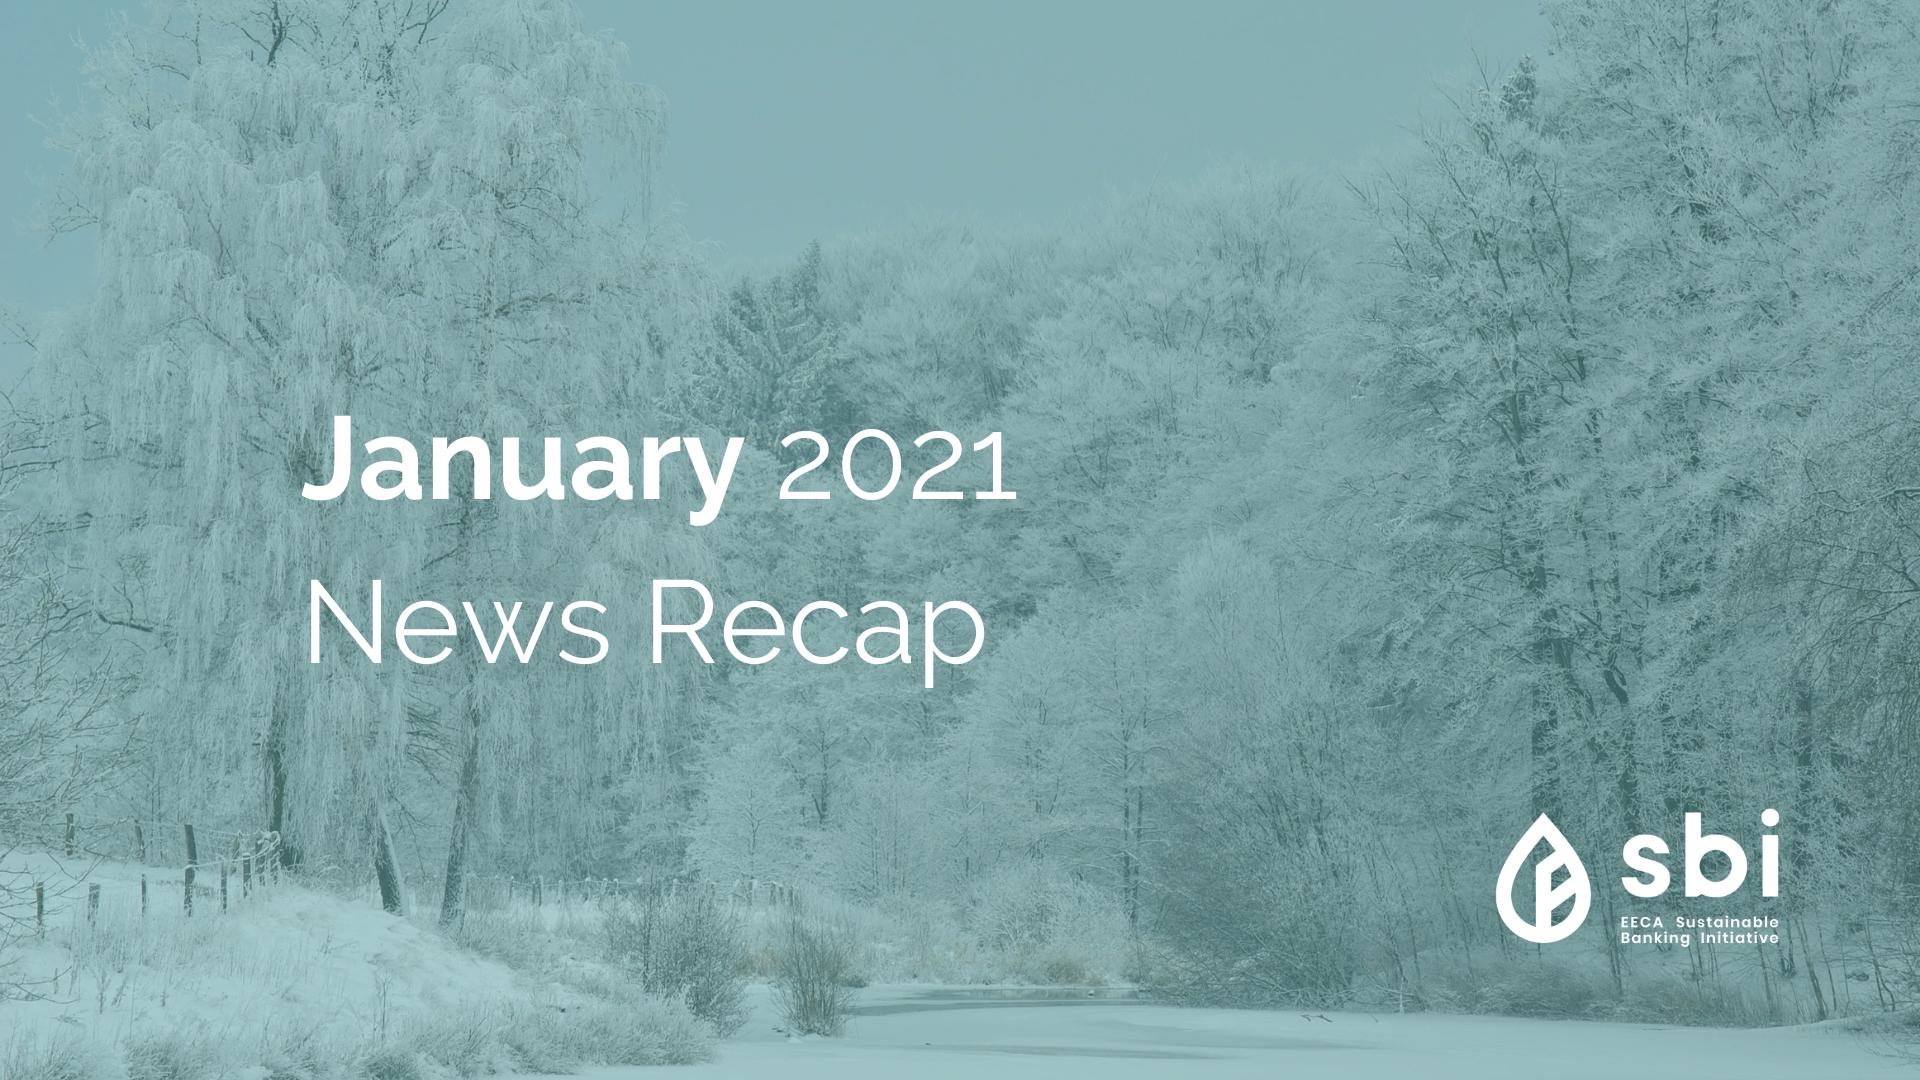 January 2021 News Recap